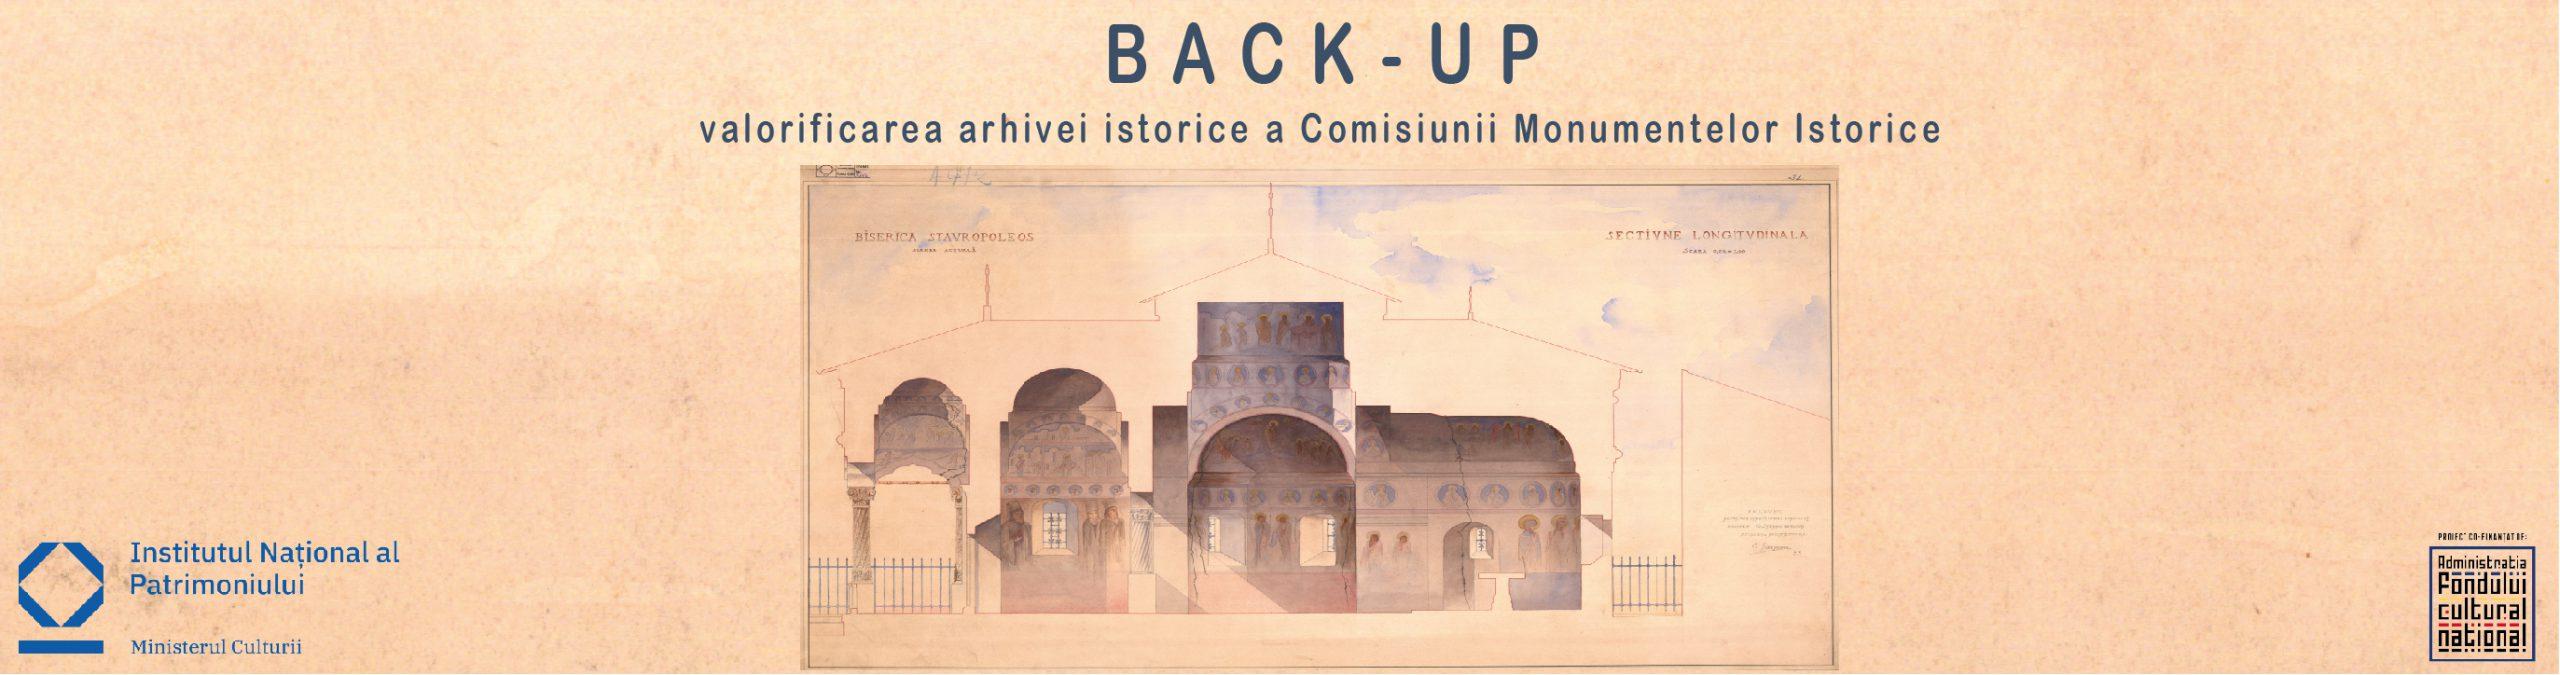 Back-up. Valorificarea arhivei istorice a Comisiunii Monumentelor Istoric